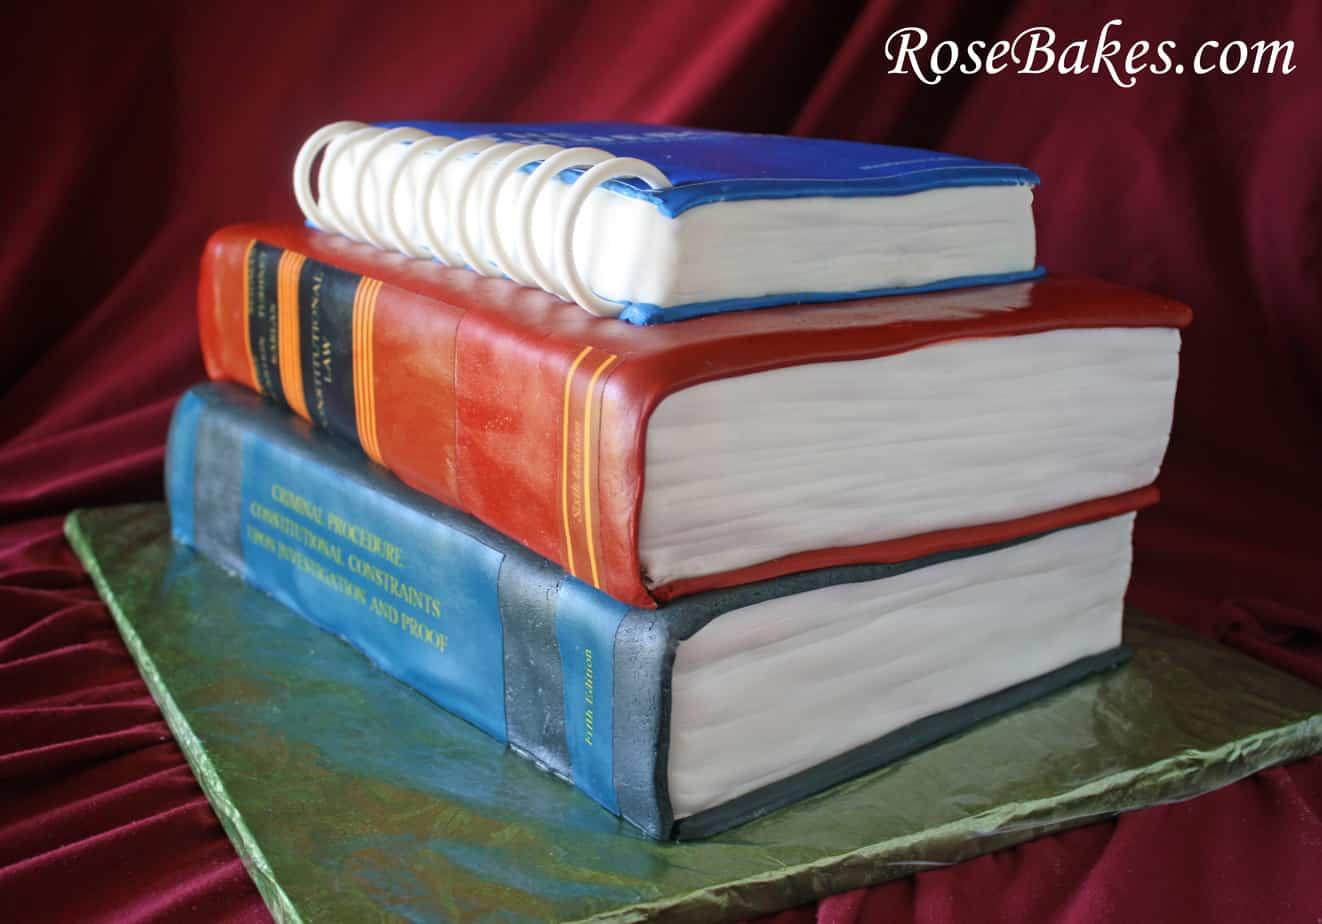 Law School Graduation Books Textbooks Grooms Cake 2